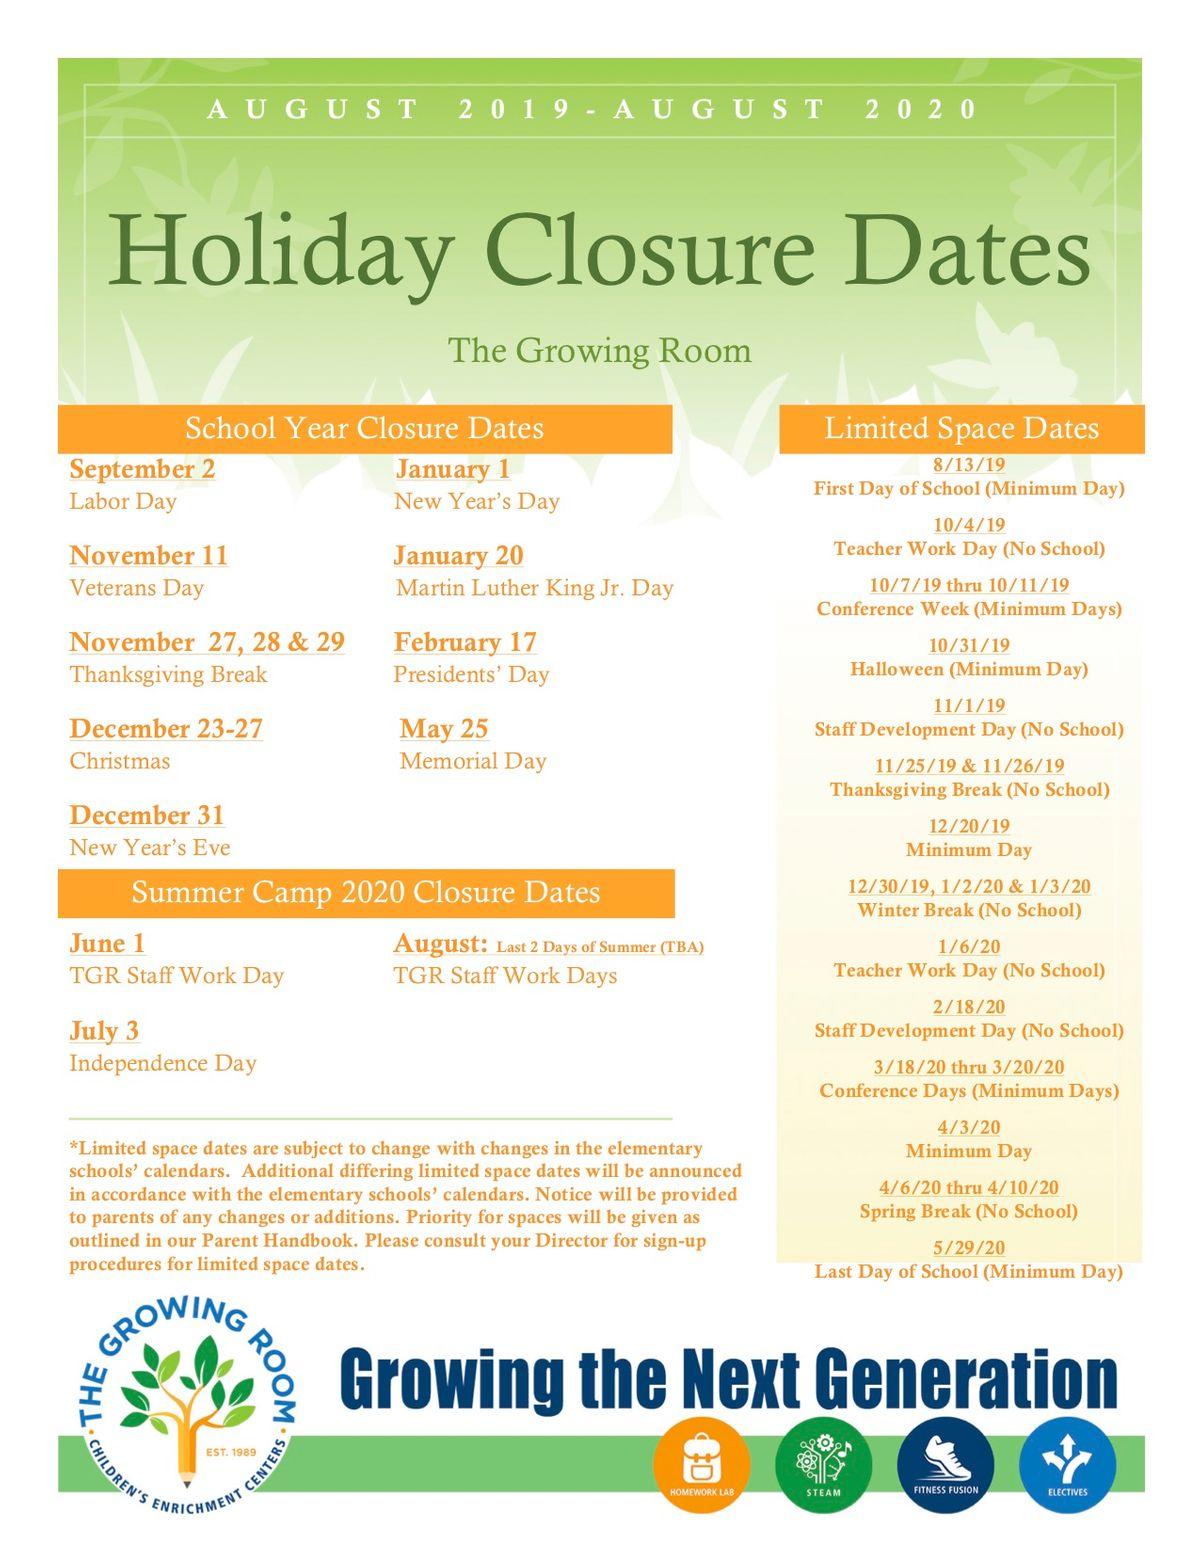 Holiday Closure Dates 2019_2020.jpg